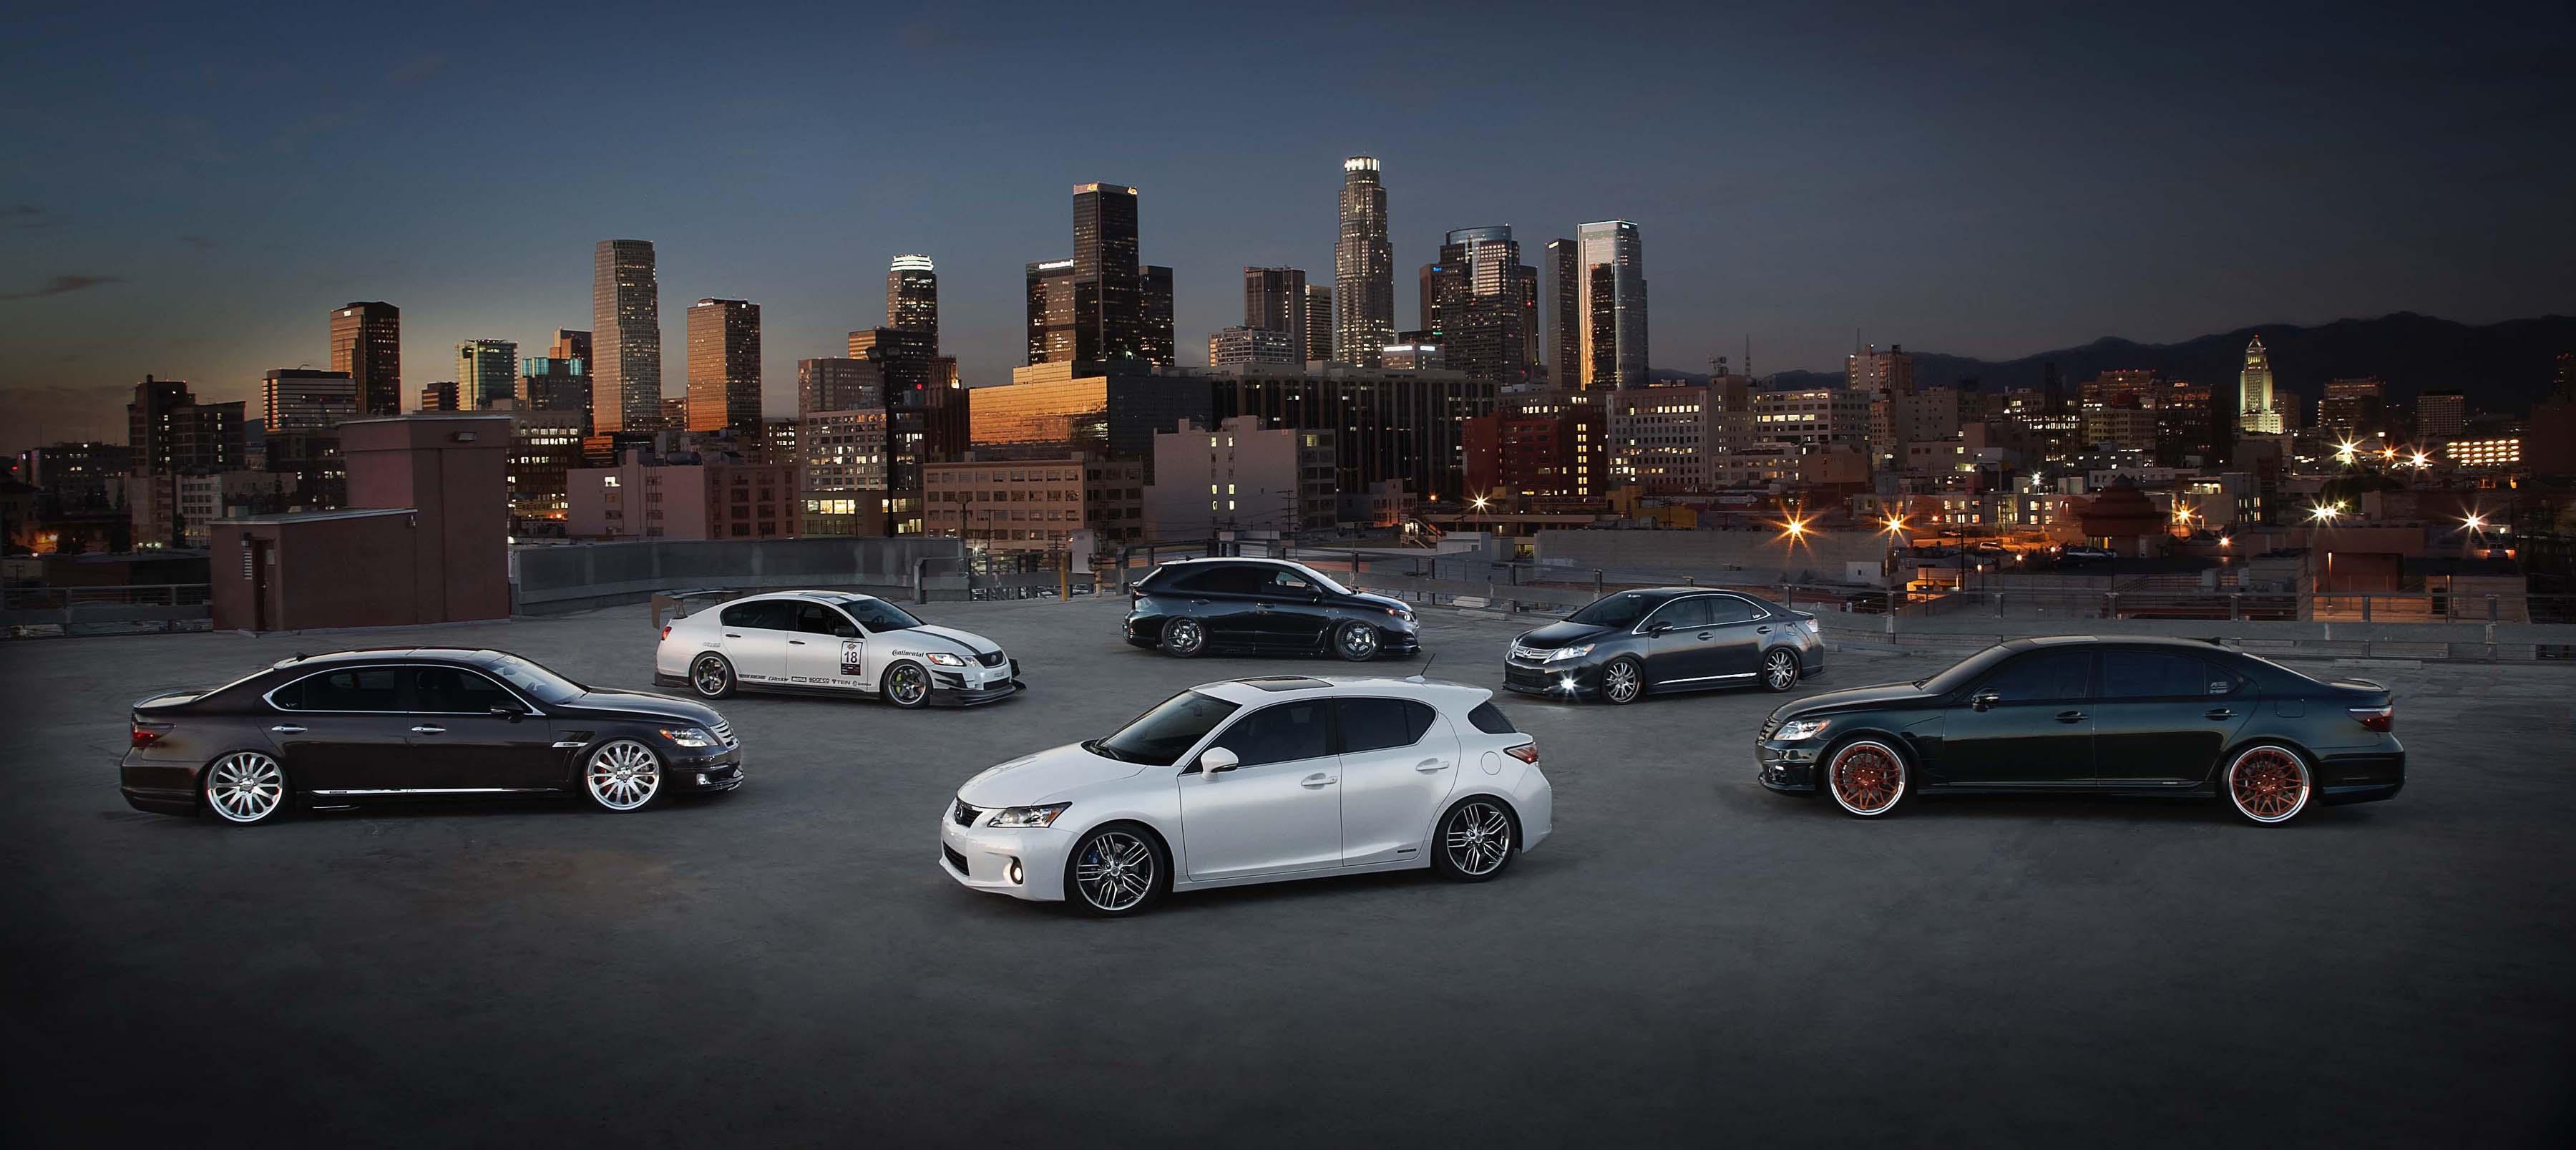 Lexus going big @ SEMA SHOW 2010. 6 Hybrids, CT F-Sport & LFA